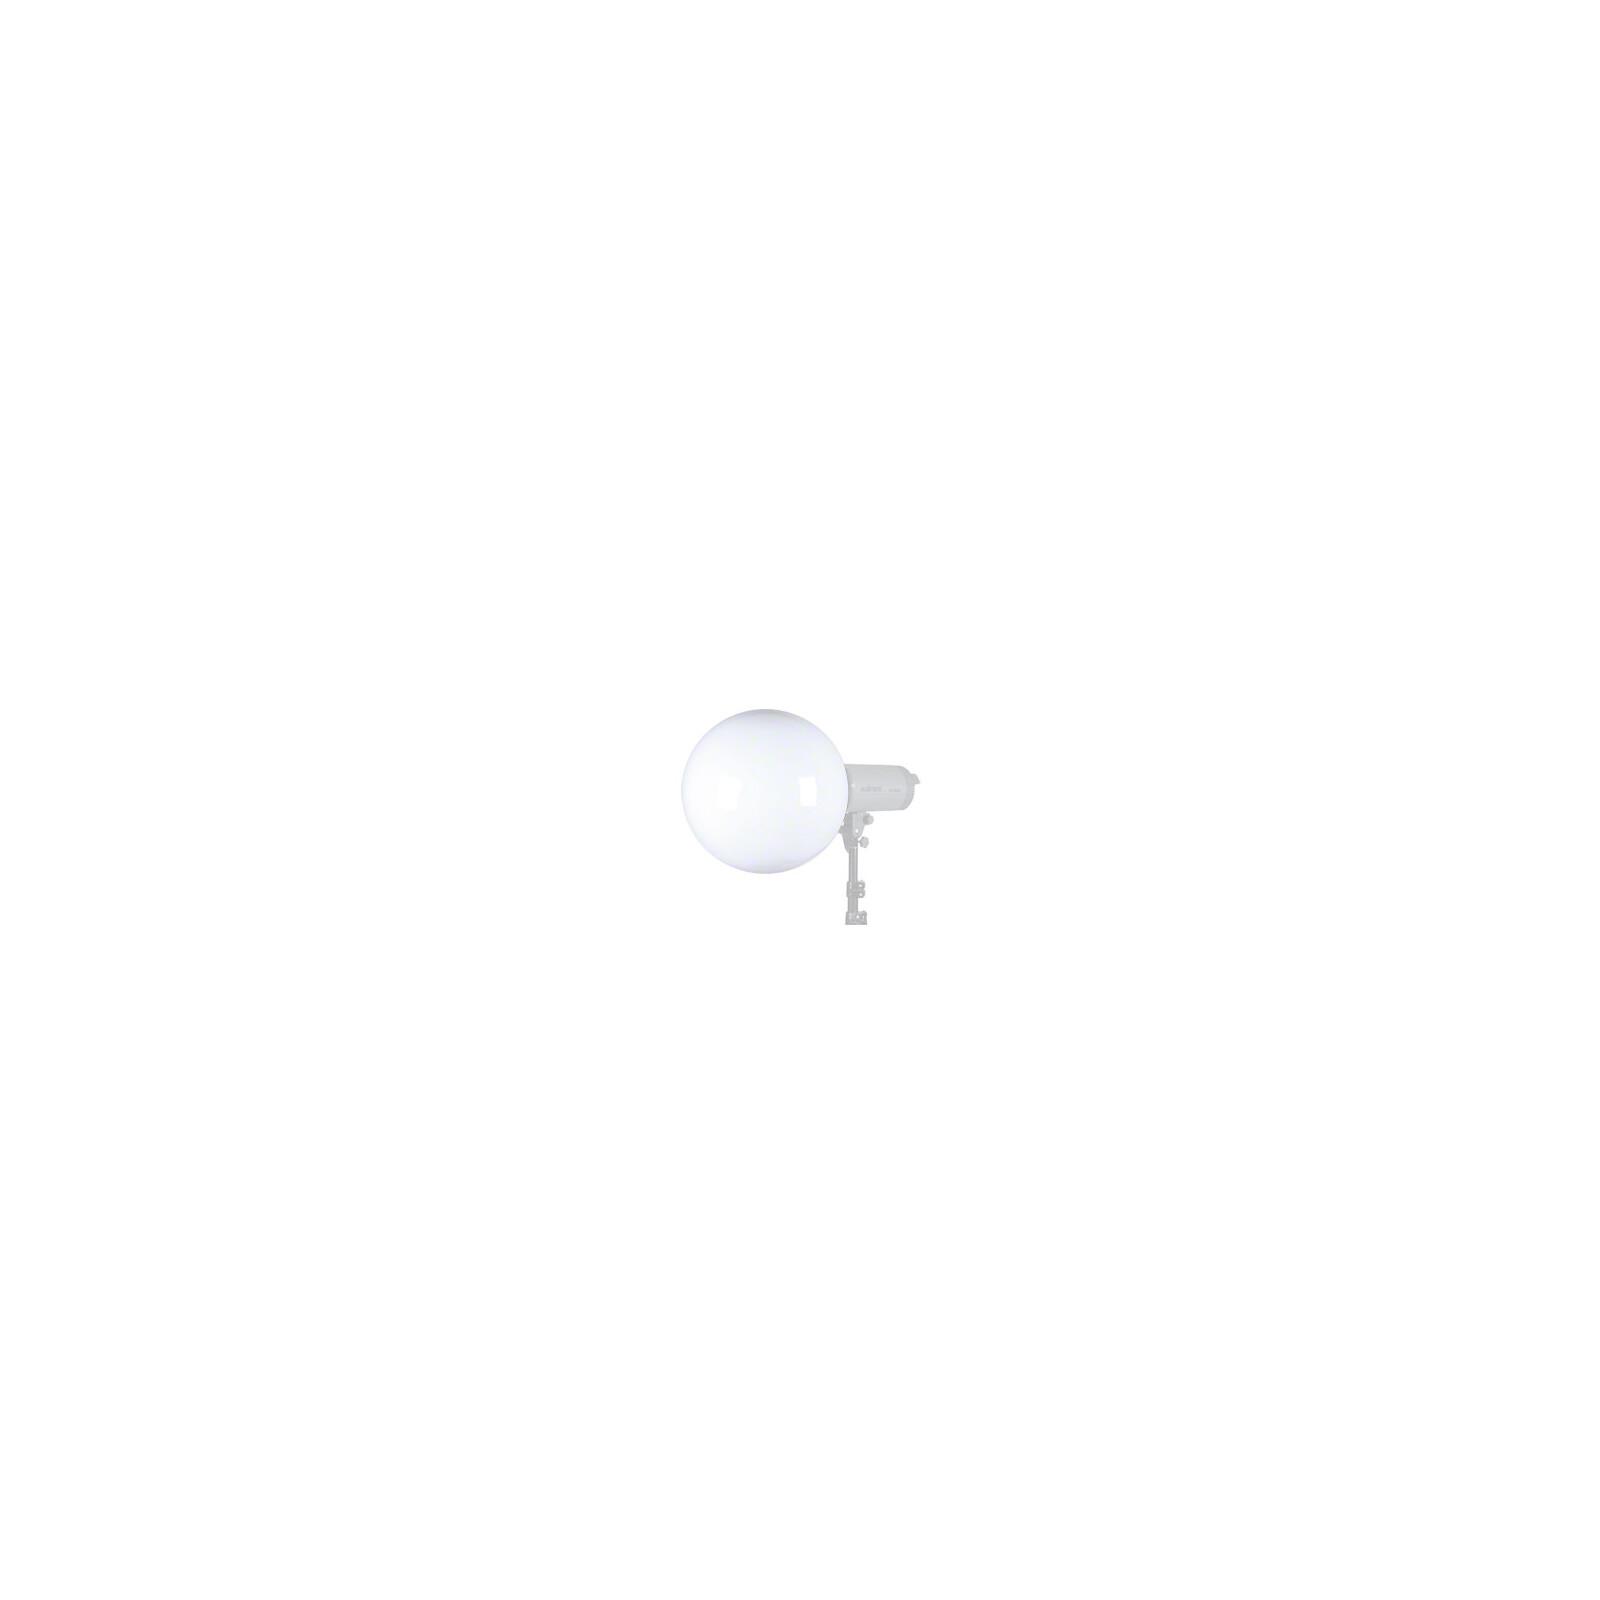 walimex Univ. Diffusorkugel, 30cm Broncolor